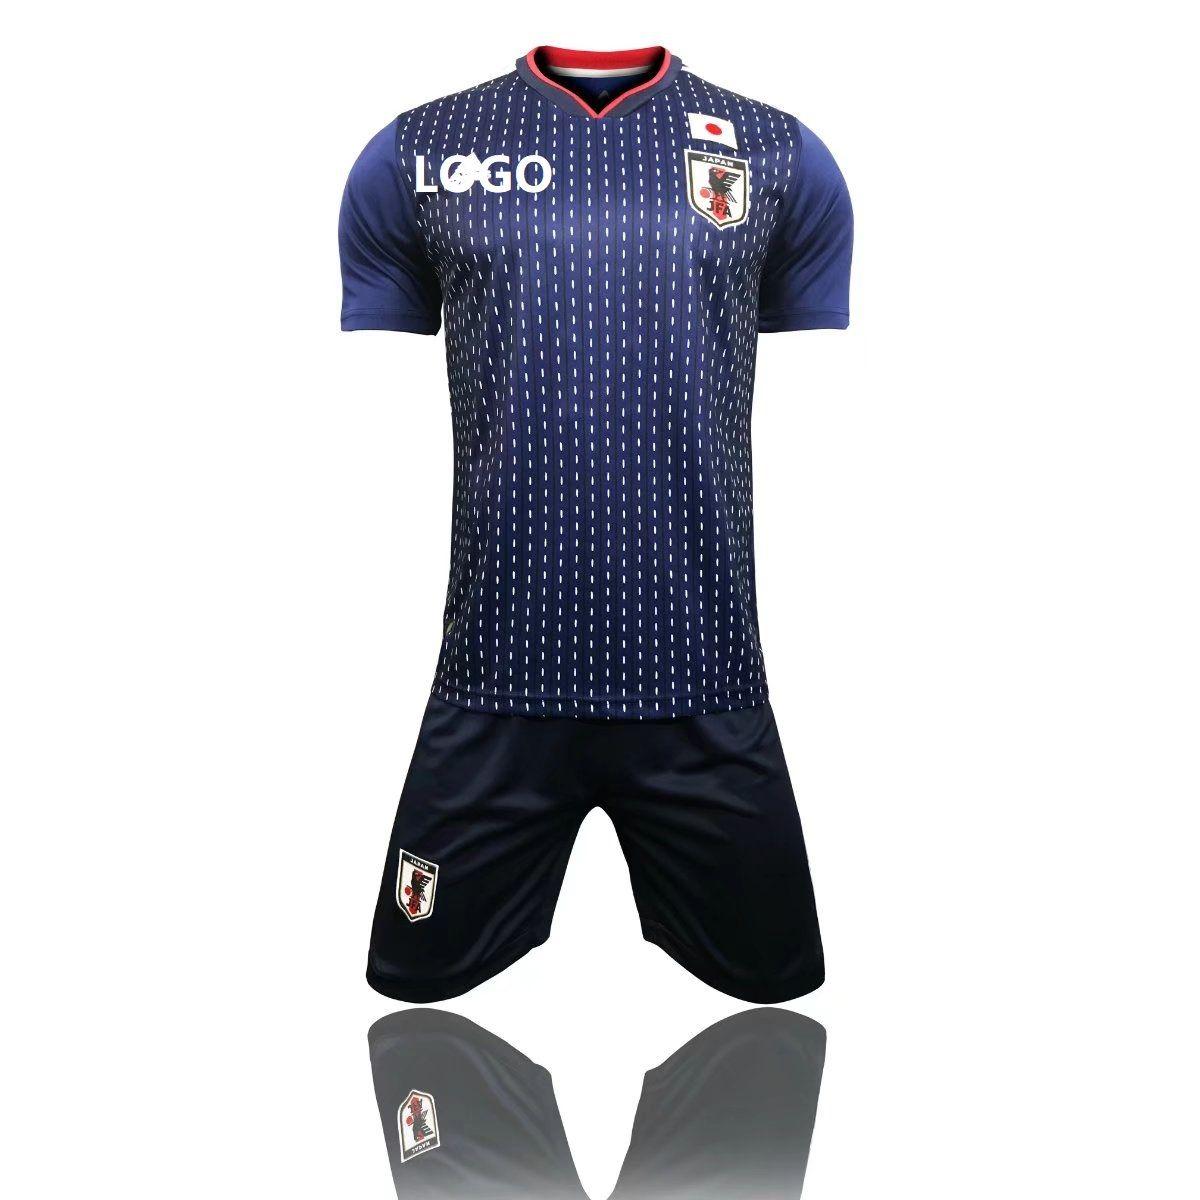 1cd73e9d5e762 2018 Adult Japan Home Blue/white Soccer Jersey Uniforms Russia World Cup  Football Team Kits